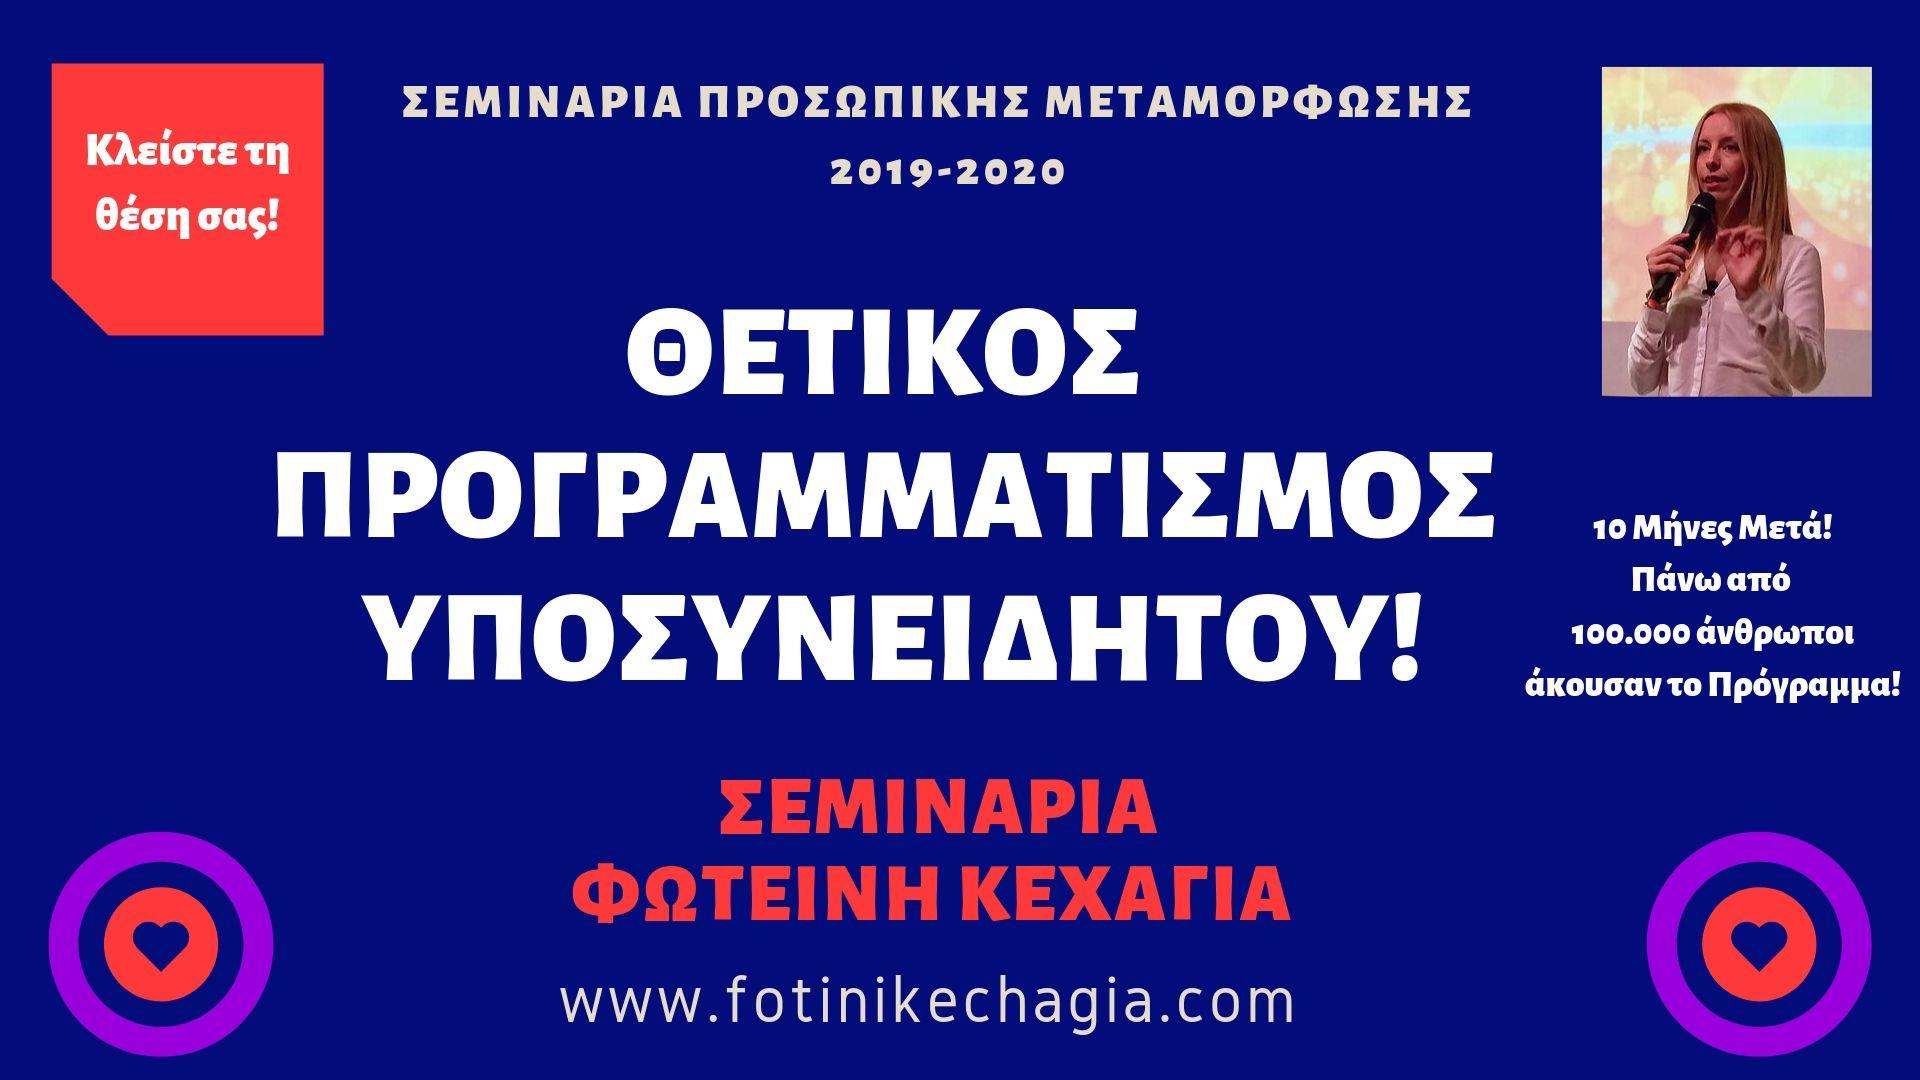 Copy of Copy of Σεμινάρια προσωπικής μεταμόρφωσης